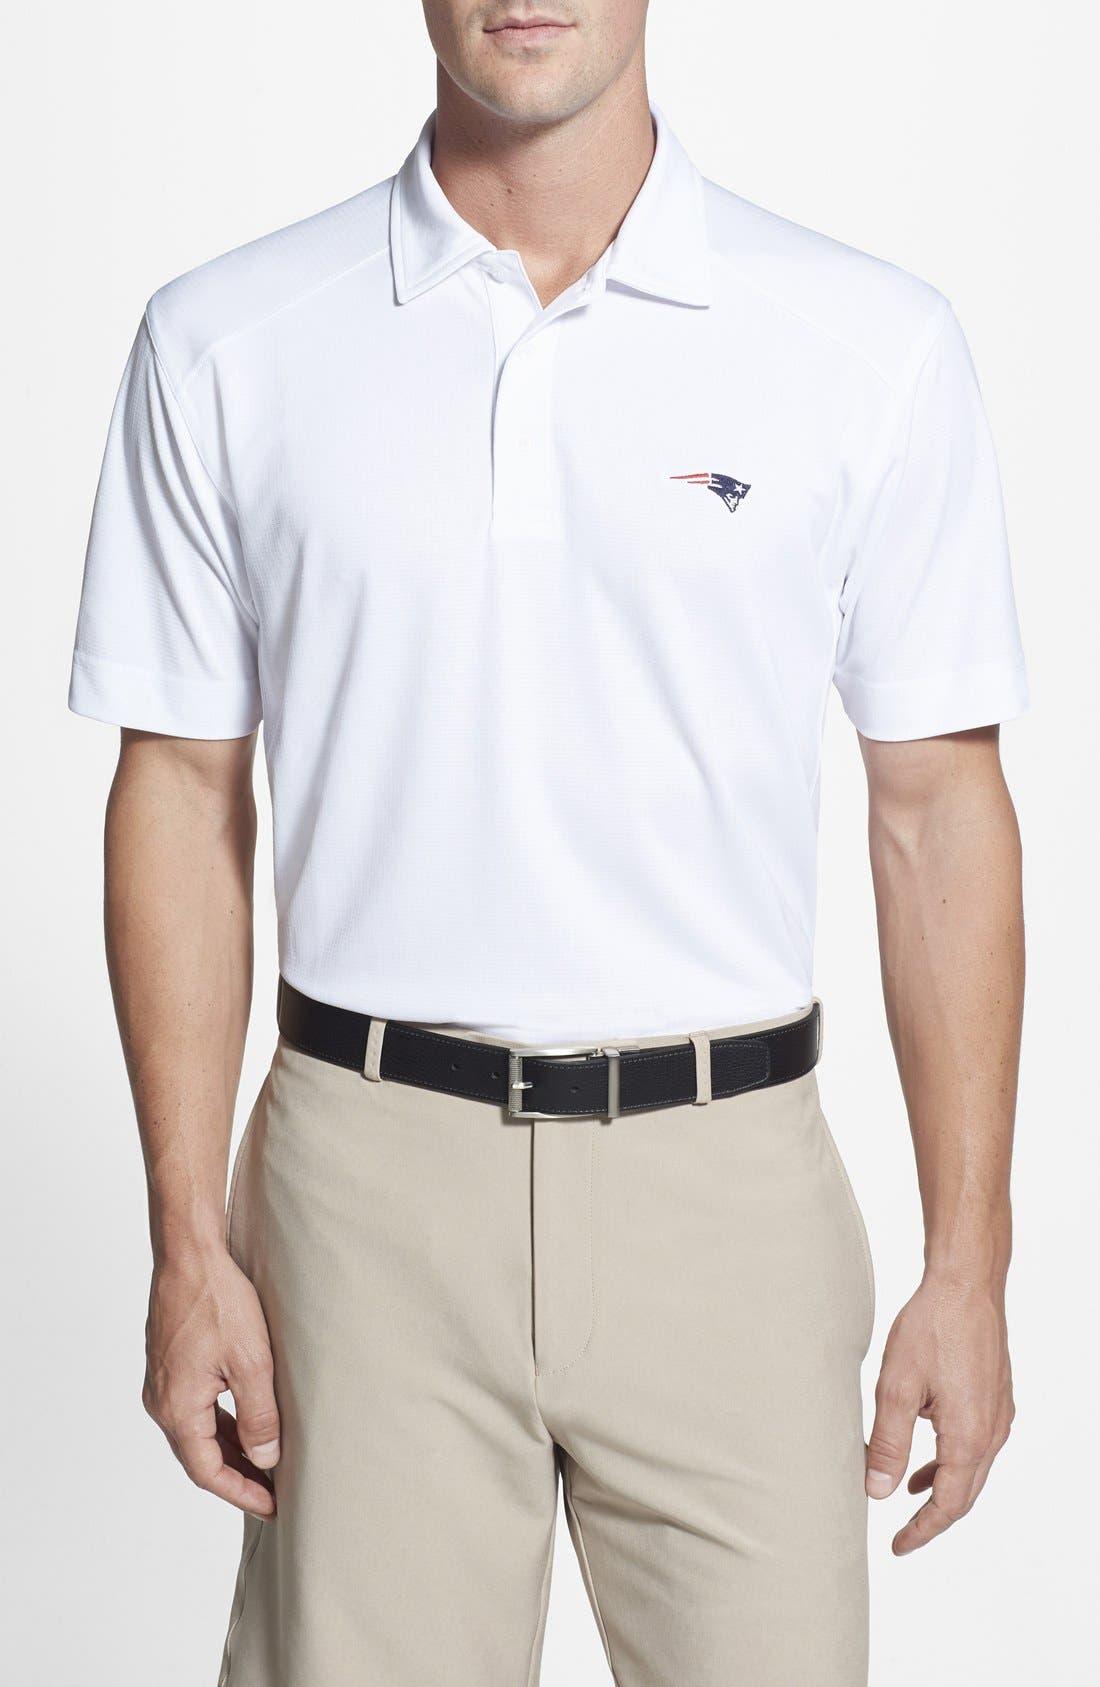 'New England Patriots - Genre' DryTec Moisture Wicking Polo,                         Main,                         color, White